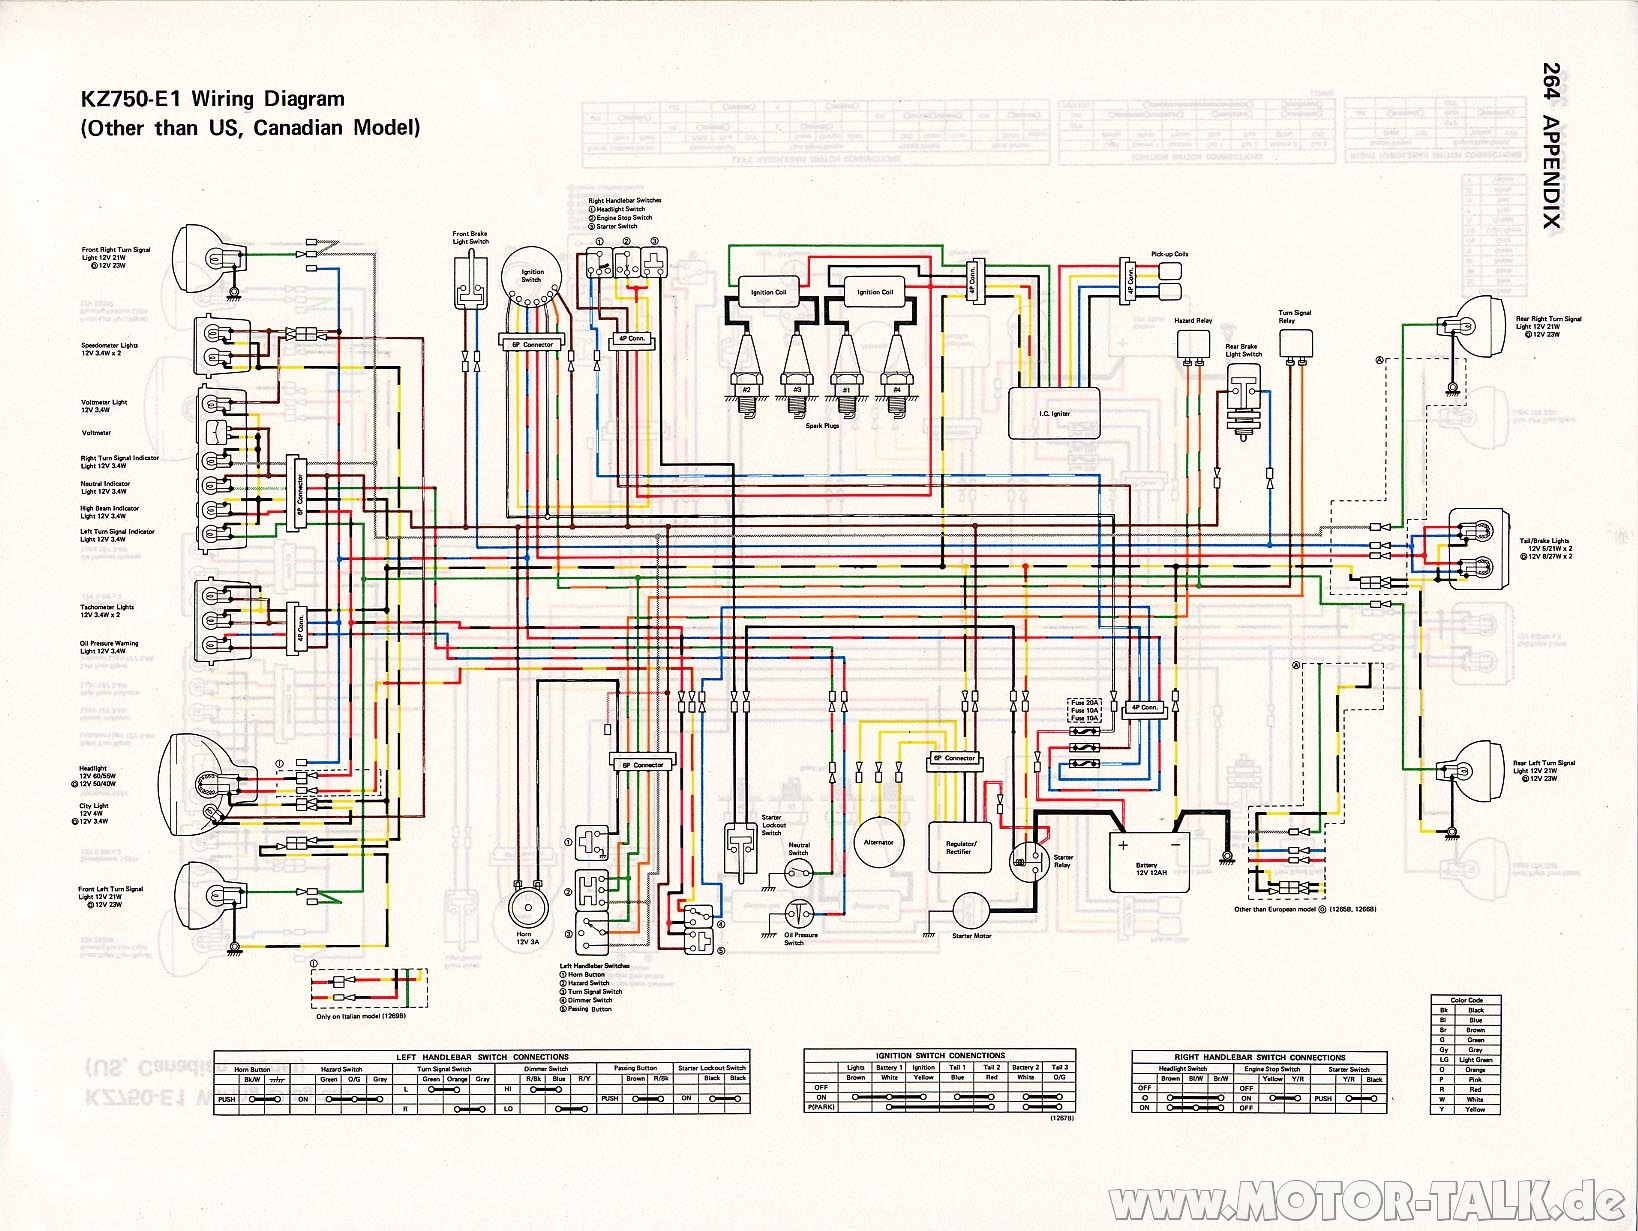 2000 ducati monster wiring diagram ducati 916 wiring diagram pdf ducati 904 wiring diagram | online wiring diagram